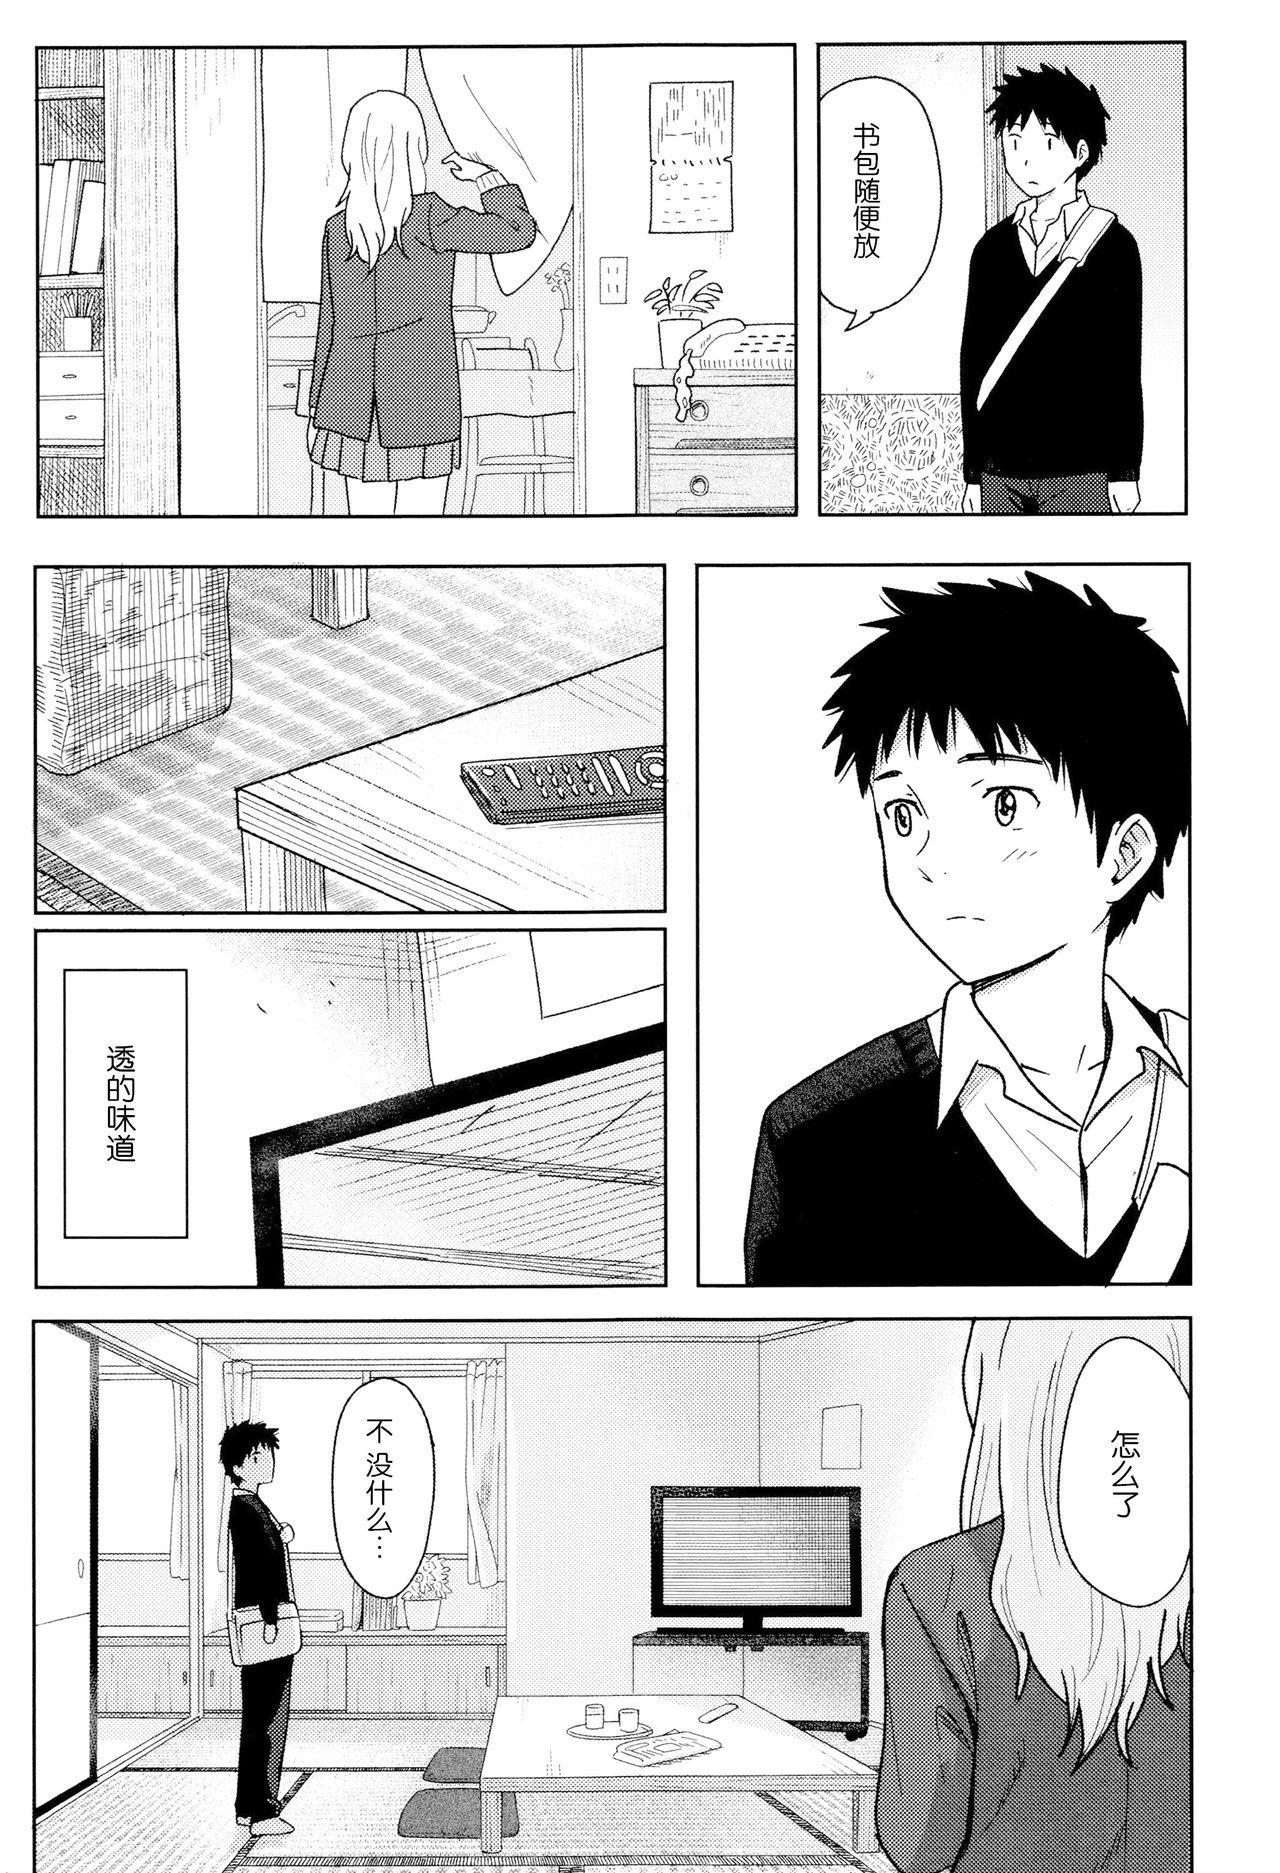 Tokubetsu na Mainichi - Special daily 15